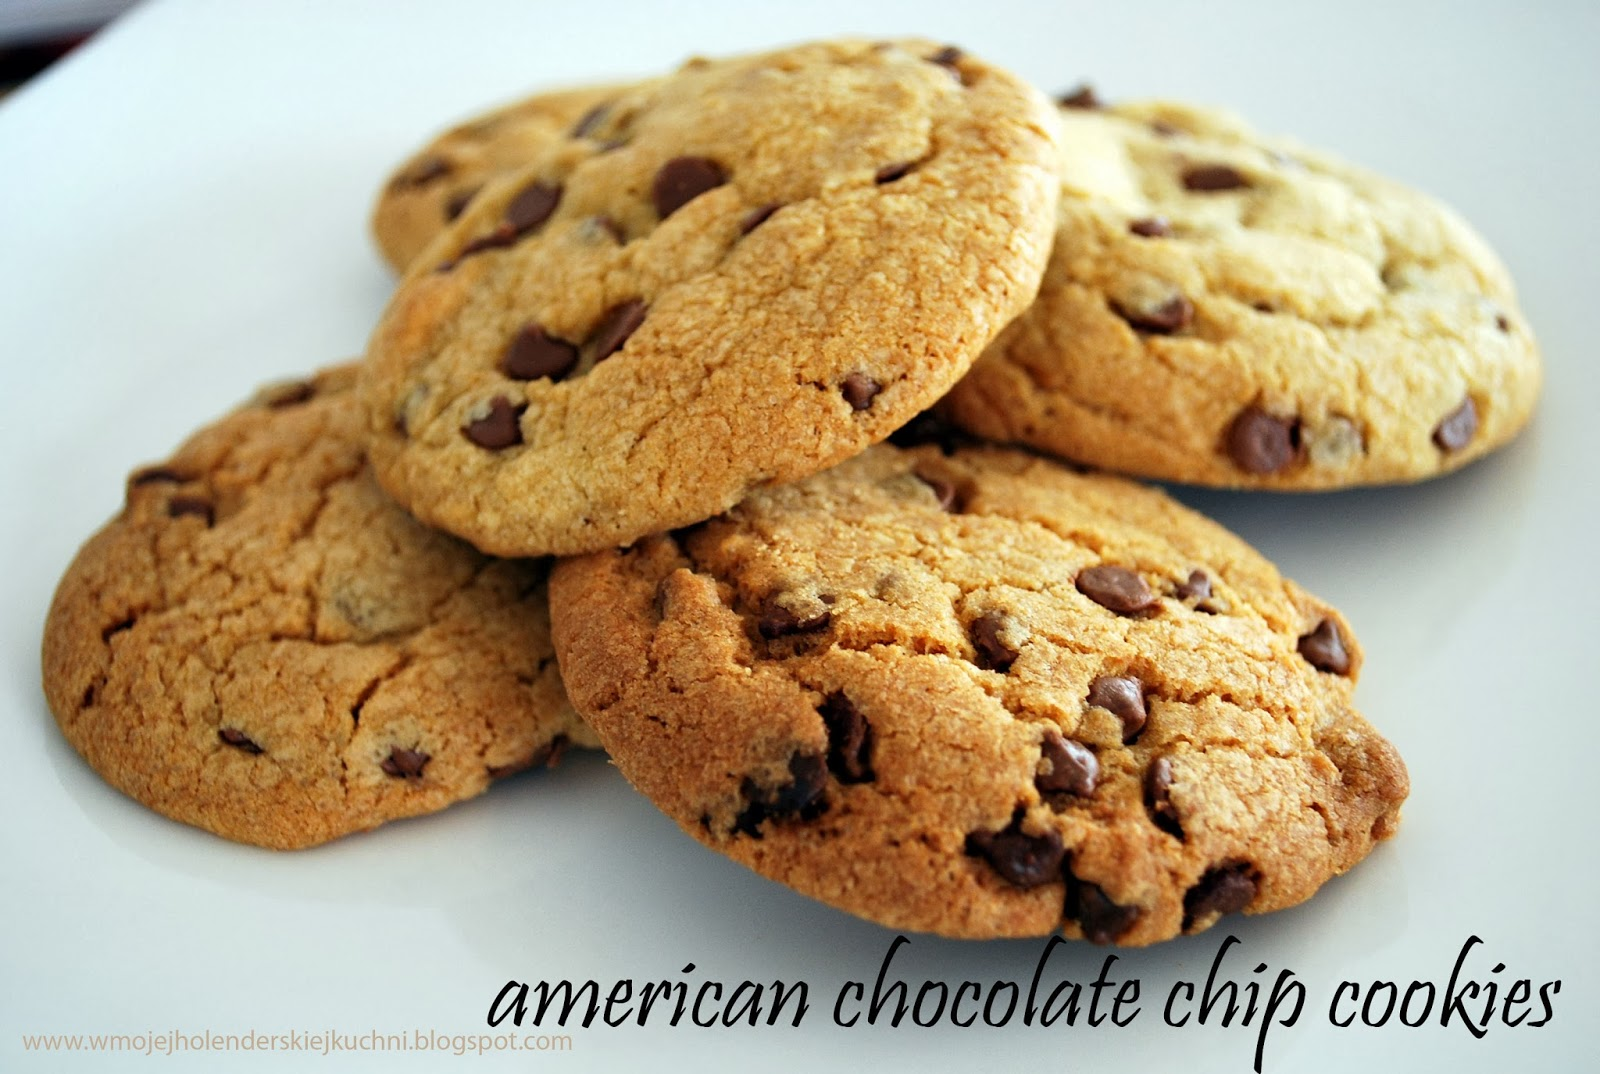 w mojej holenderskiej kuchni american chocolate chip cookies. Black Bedroom Furniture Sets. Home Design Ideas